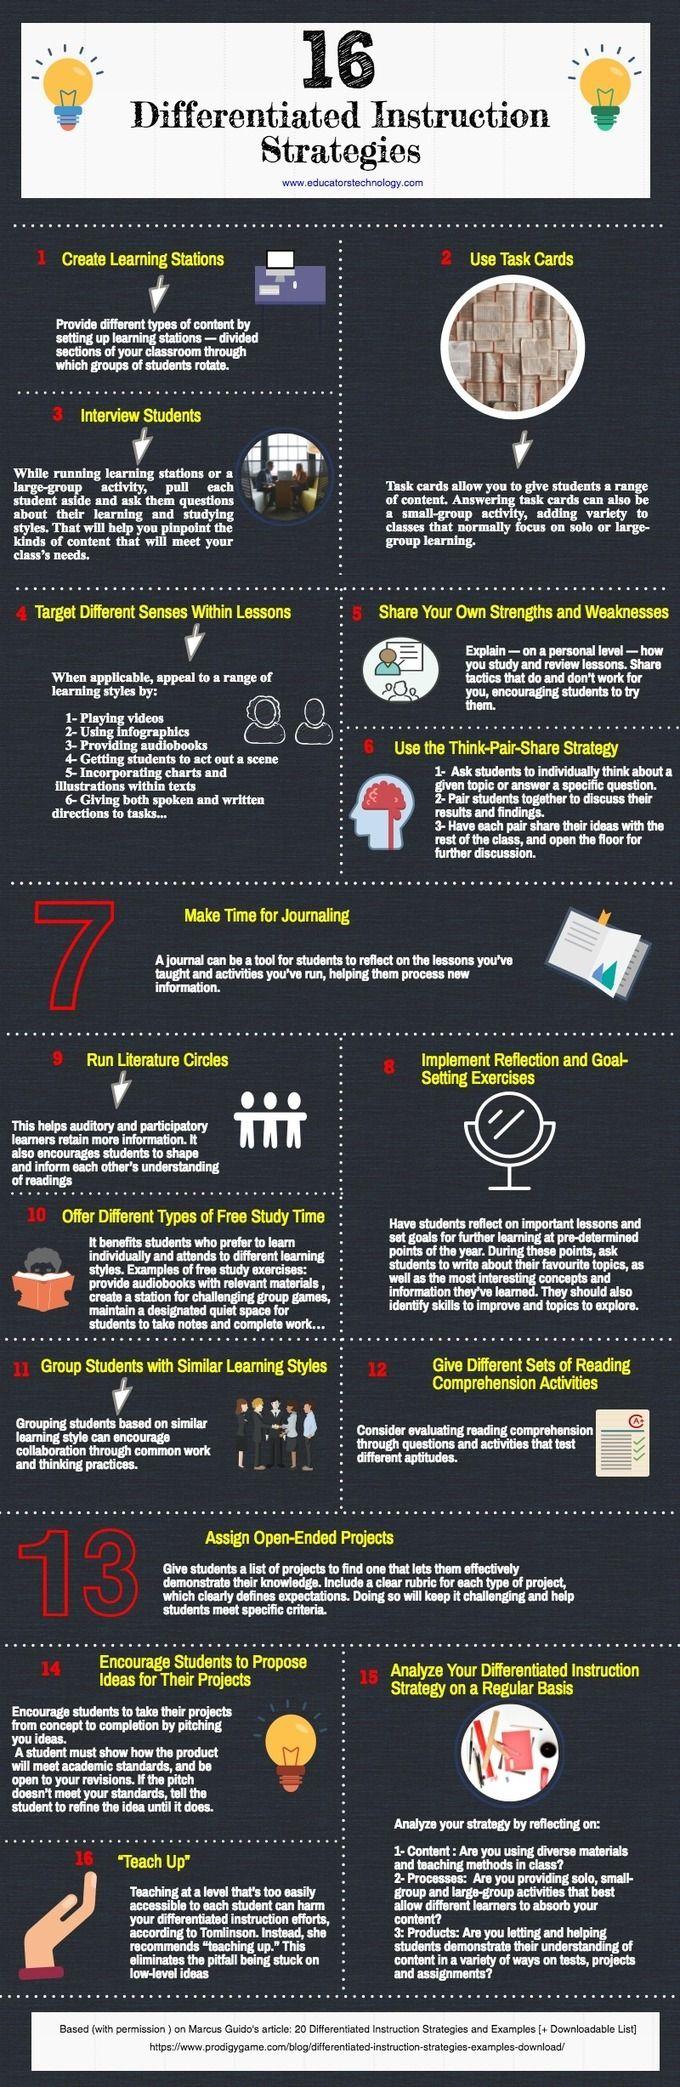 differentiated instruction strategies for kindergarten